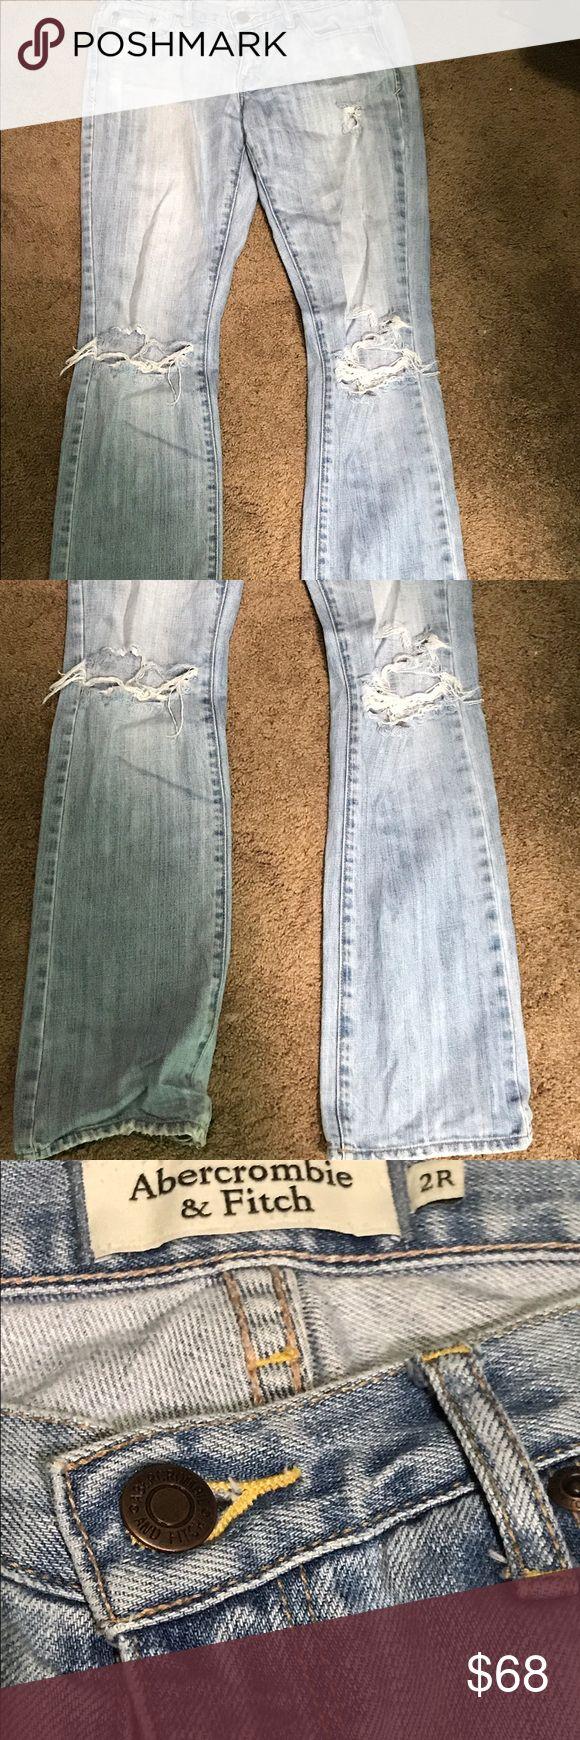 Light Wash Bootcut Abercrombie Jeans Light wash, ripped Abercrombie denim jeans Abercrombie & Fitch Jeans Boot Cut